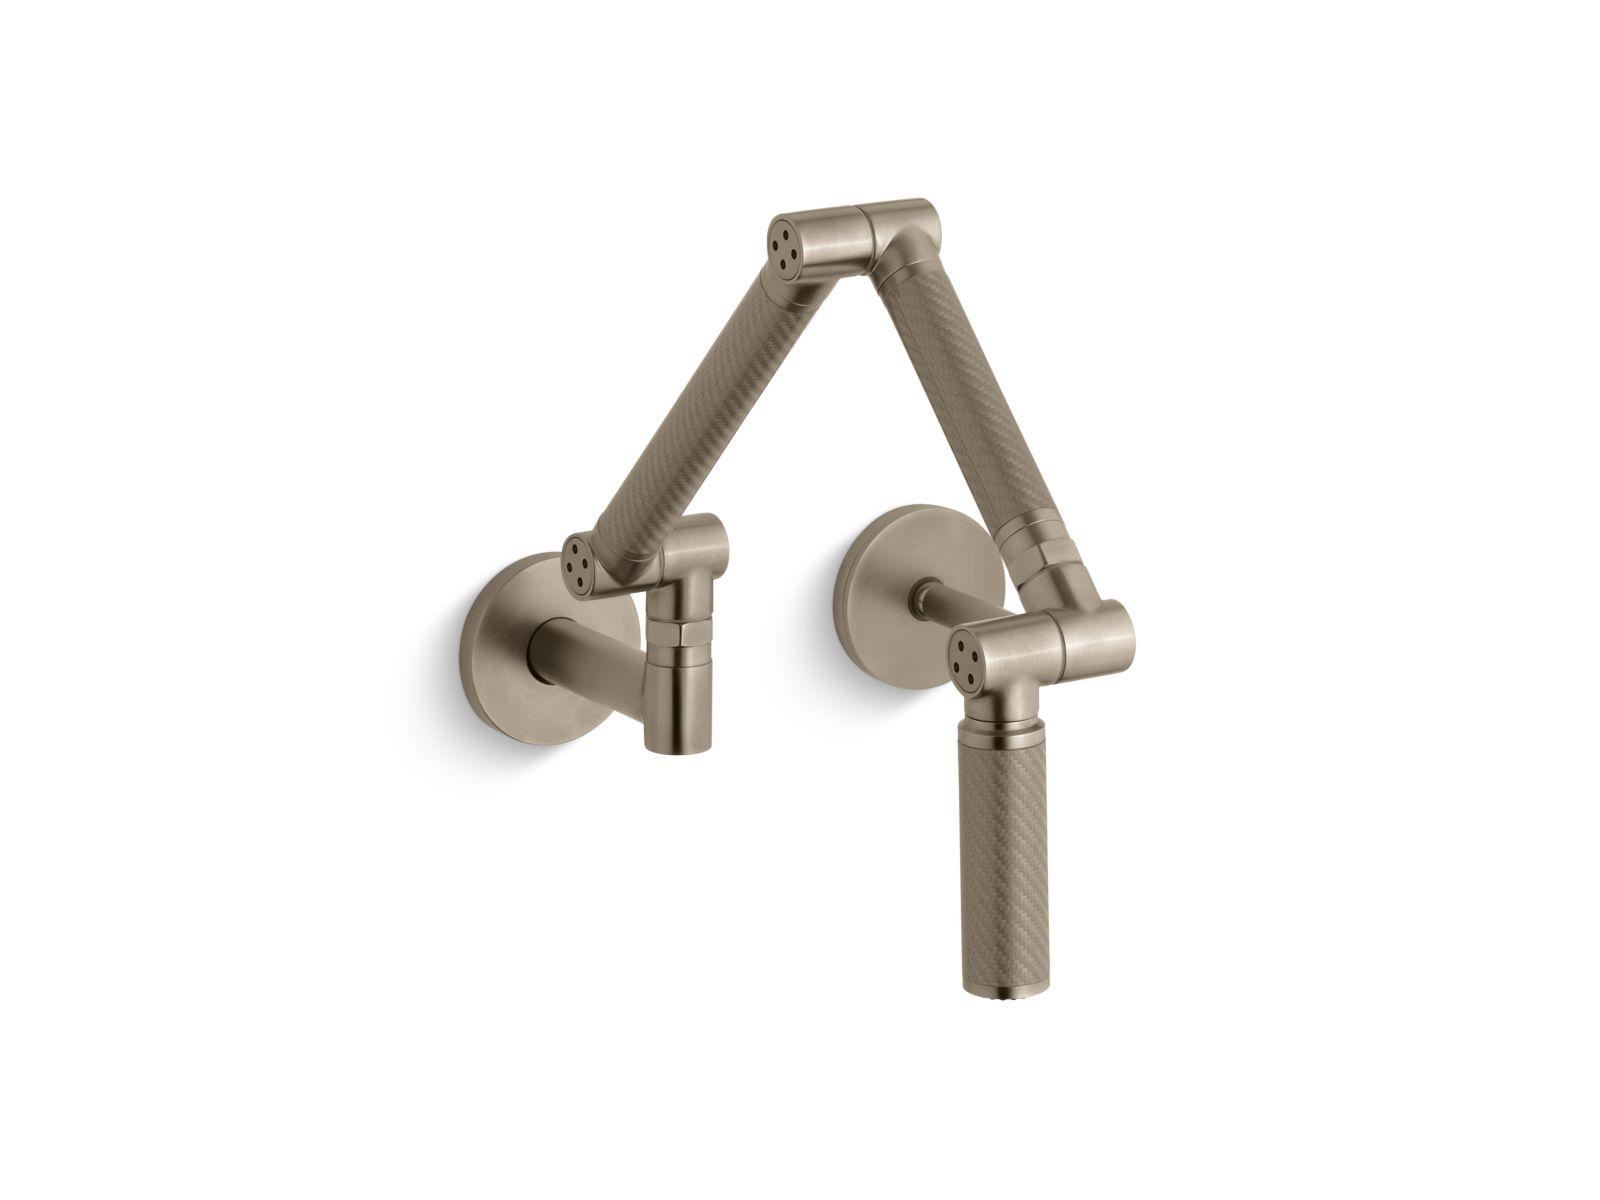 kohler karbon faucet wall mount kohler karbon faucet wall mount buyplumbing category wall mount faucet 1600 x 1200